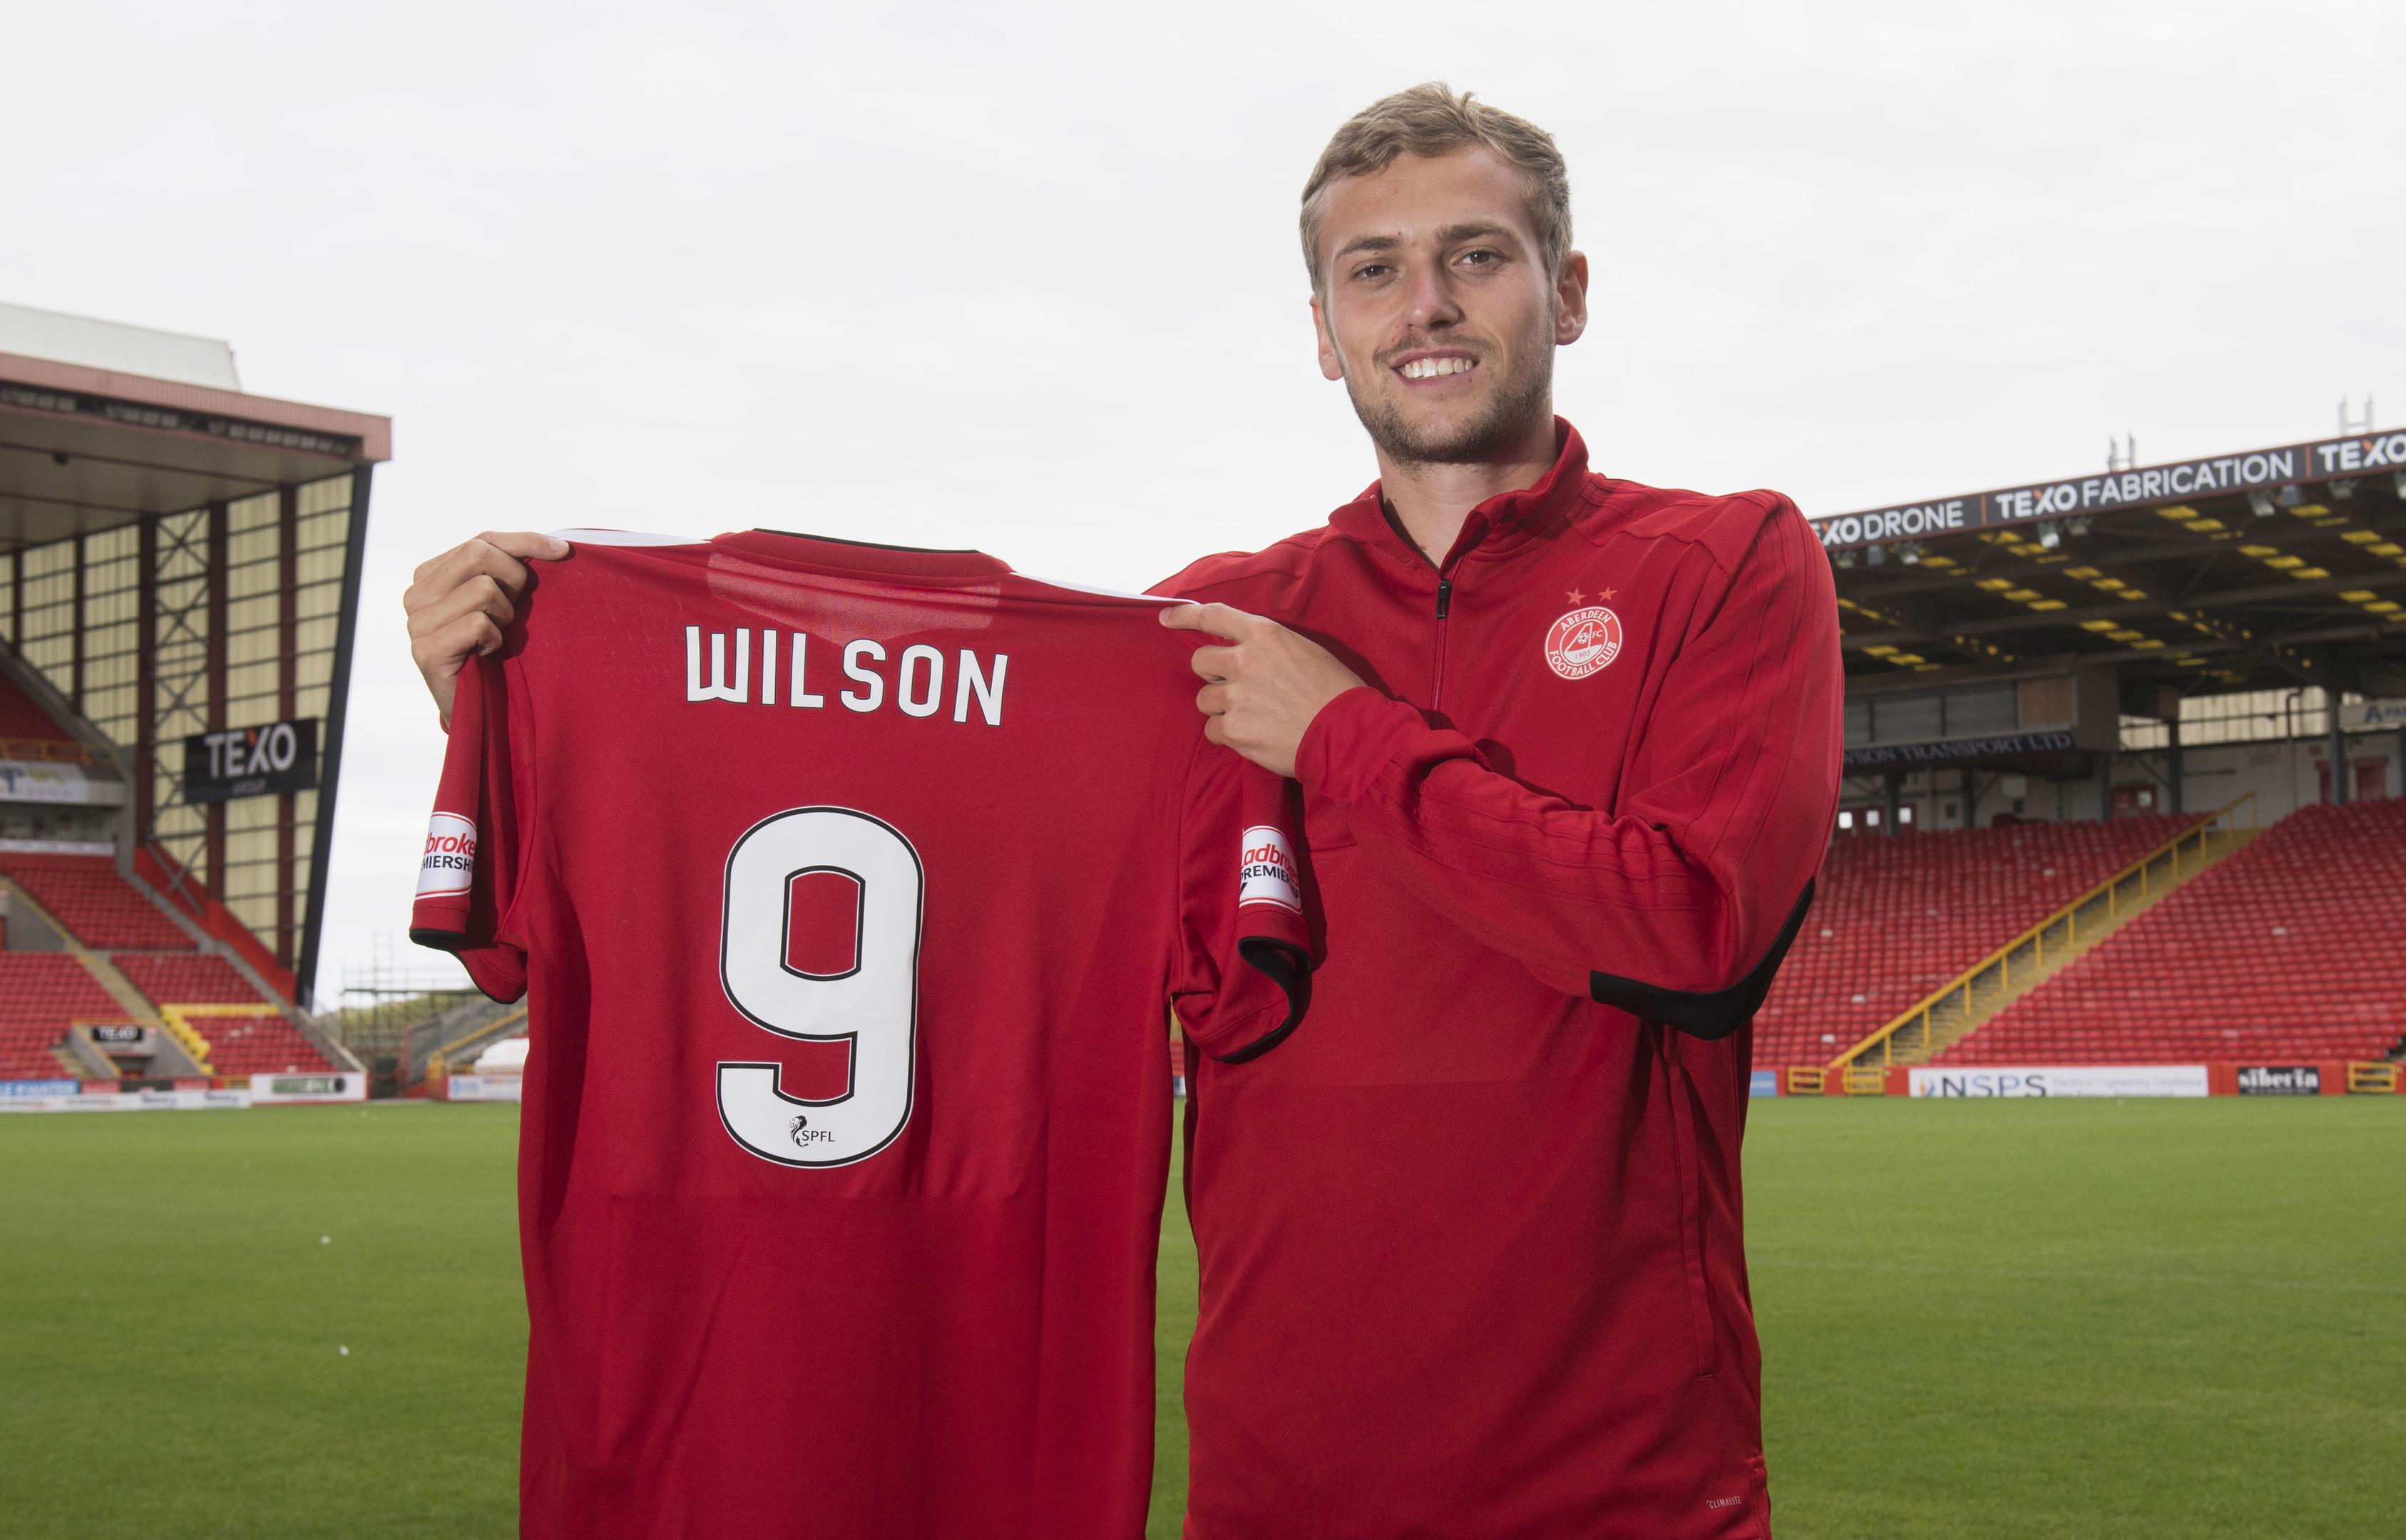 James Wilson faces a big season on loan at Aberdeen.